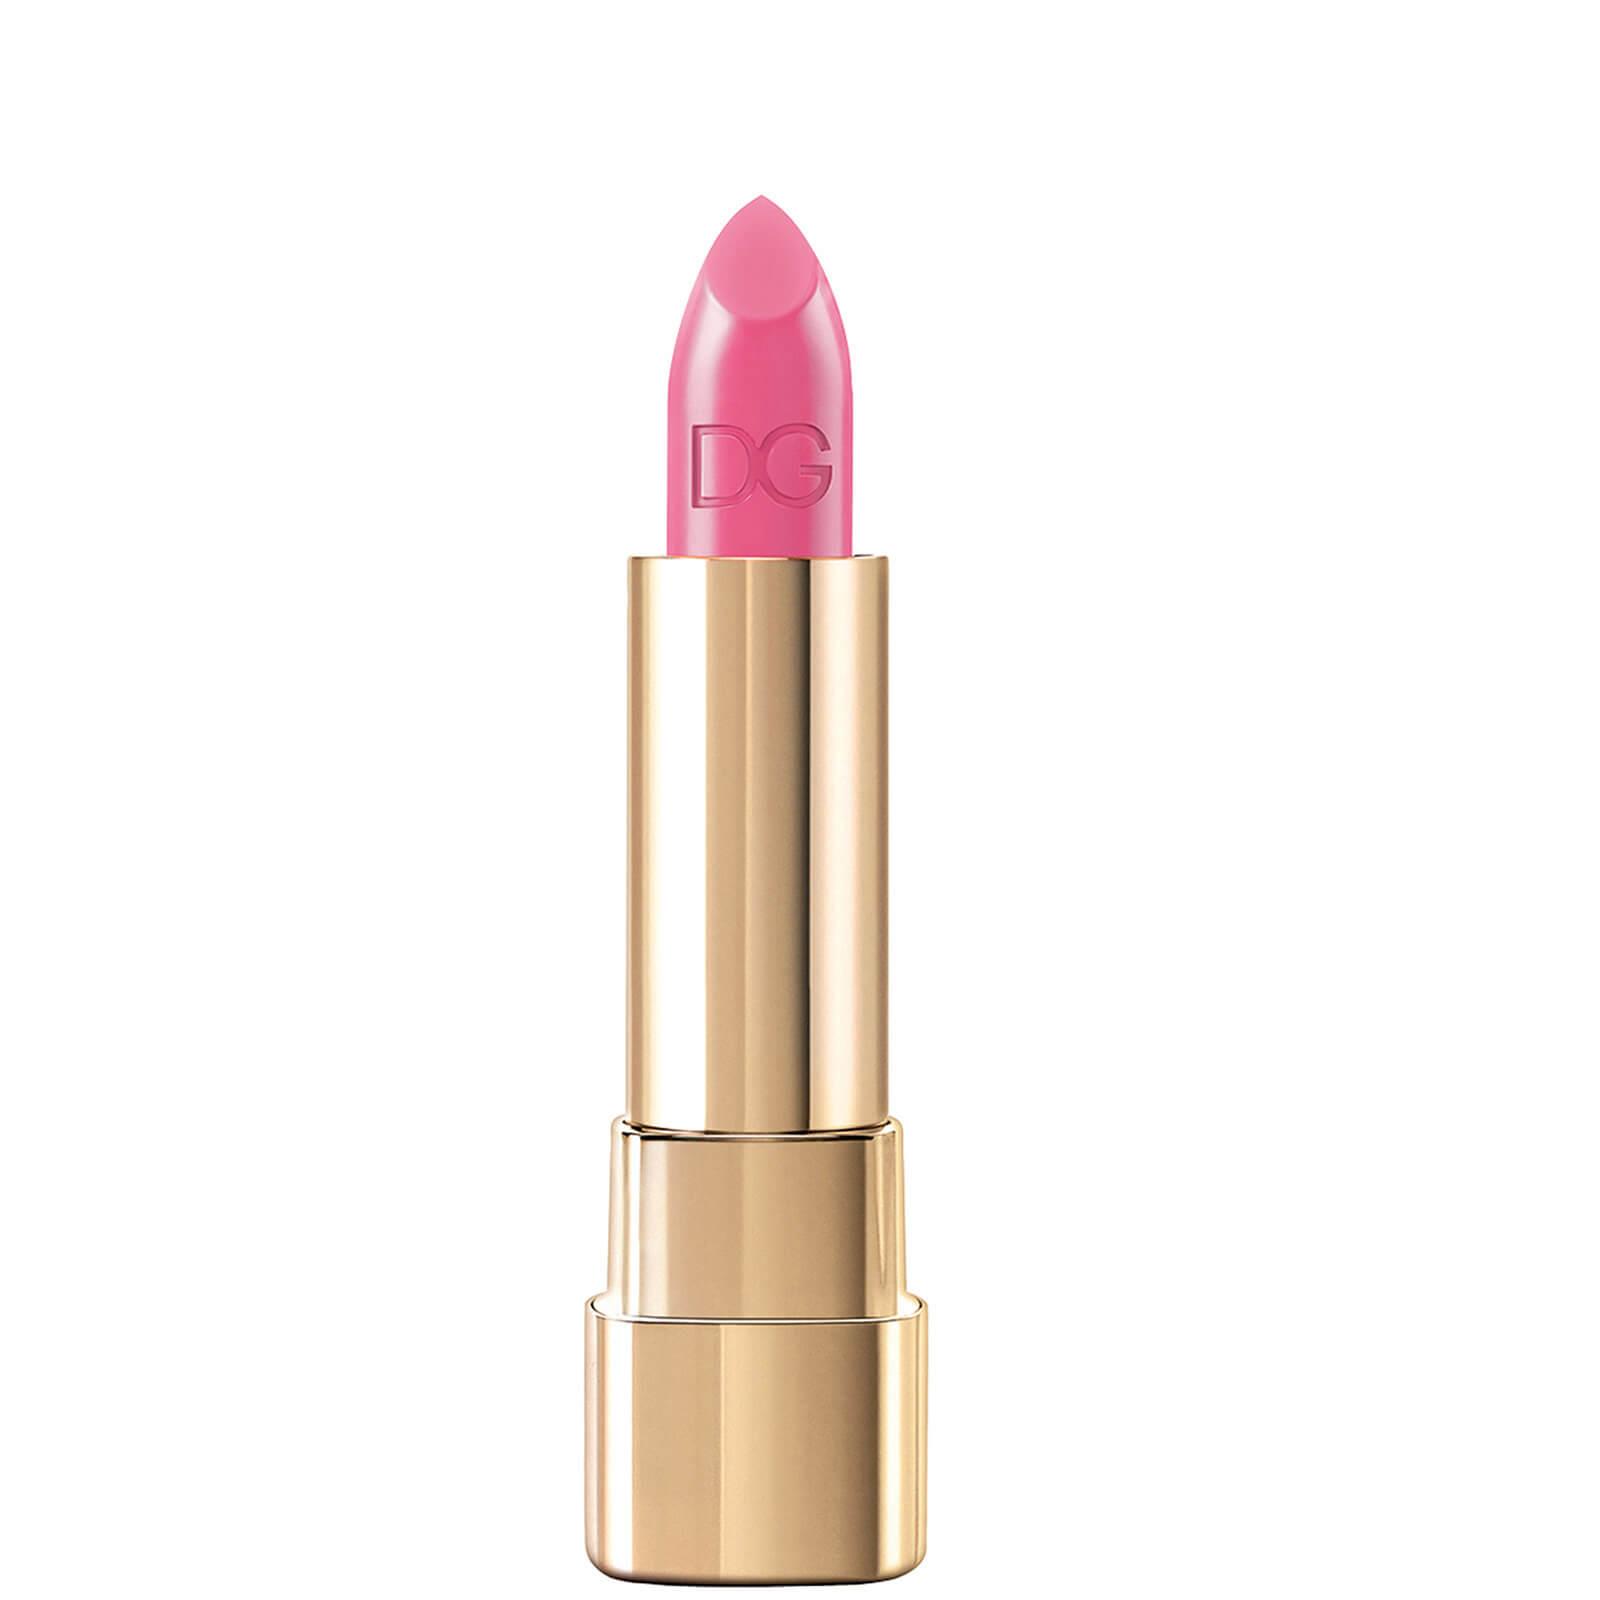 Dolce&Gabbana Classic Cream Lipstick 3.5g (Various Shades) - 260 Provocative